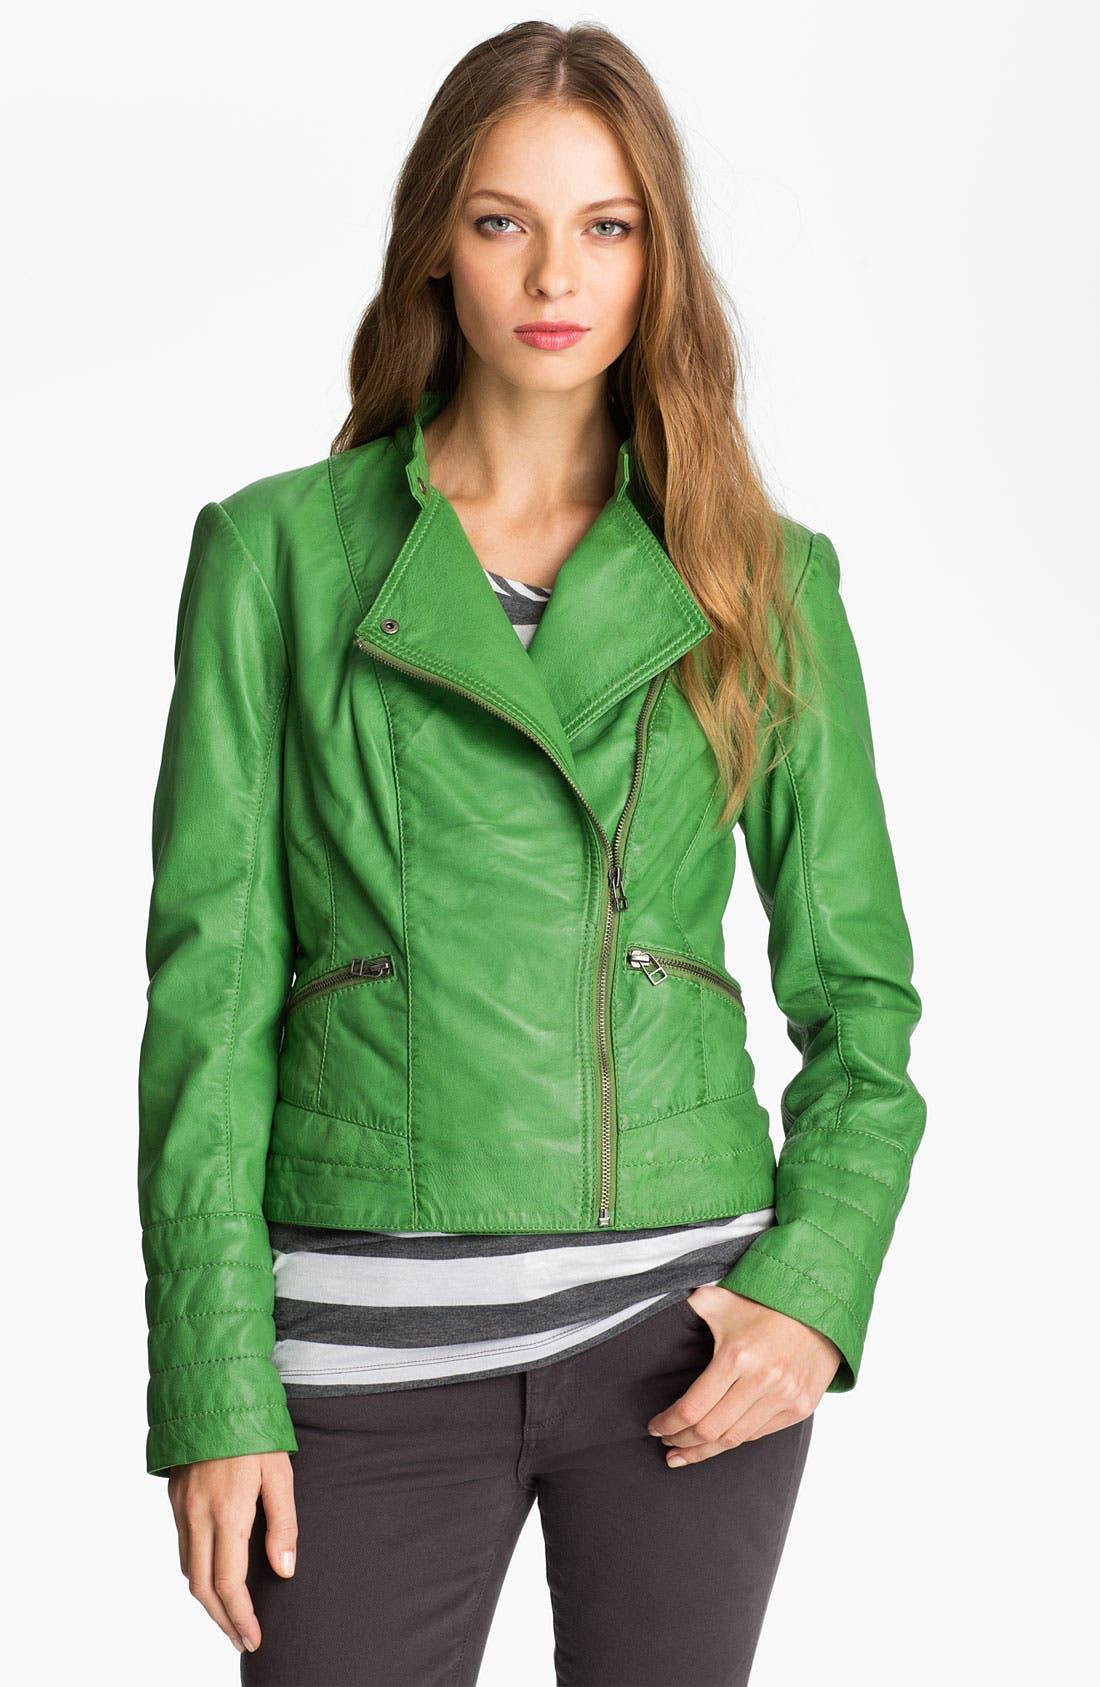 Main Image - Bernardo Leather Moto Jacket (Regular & Petite) (Nordstrom Exclusive)